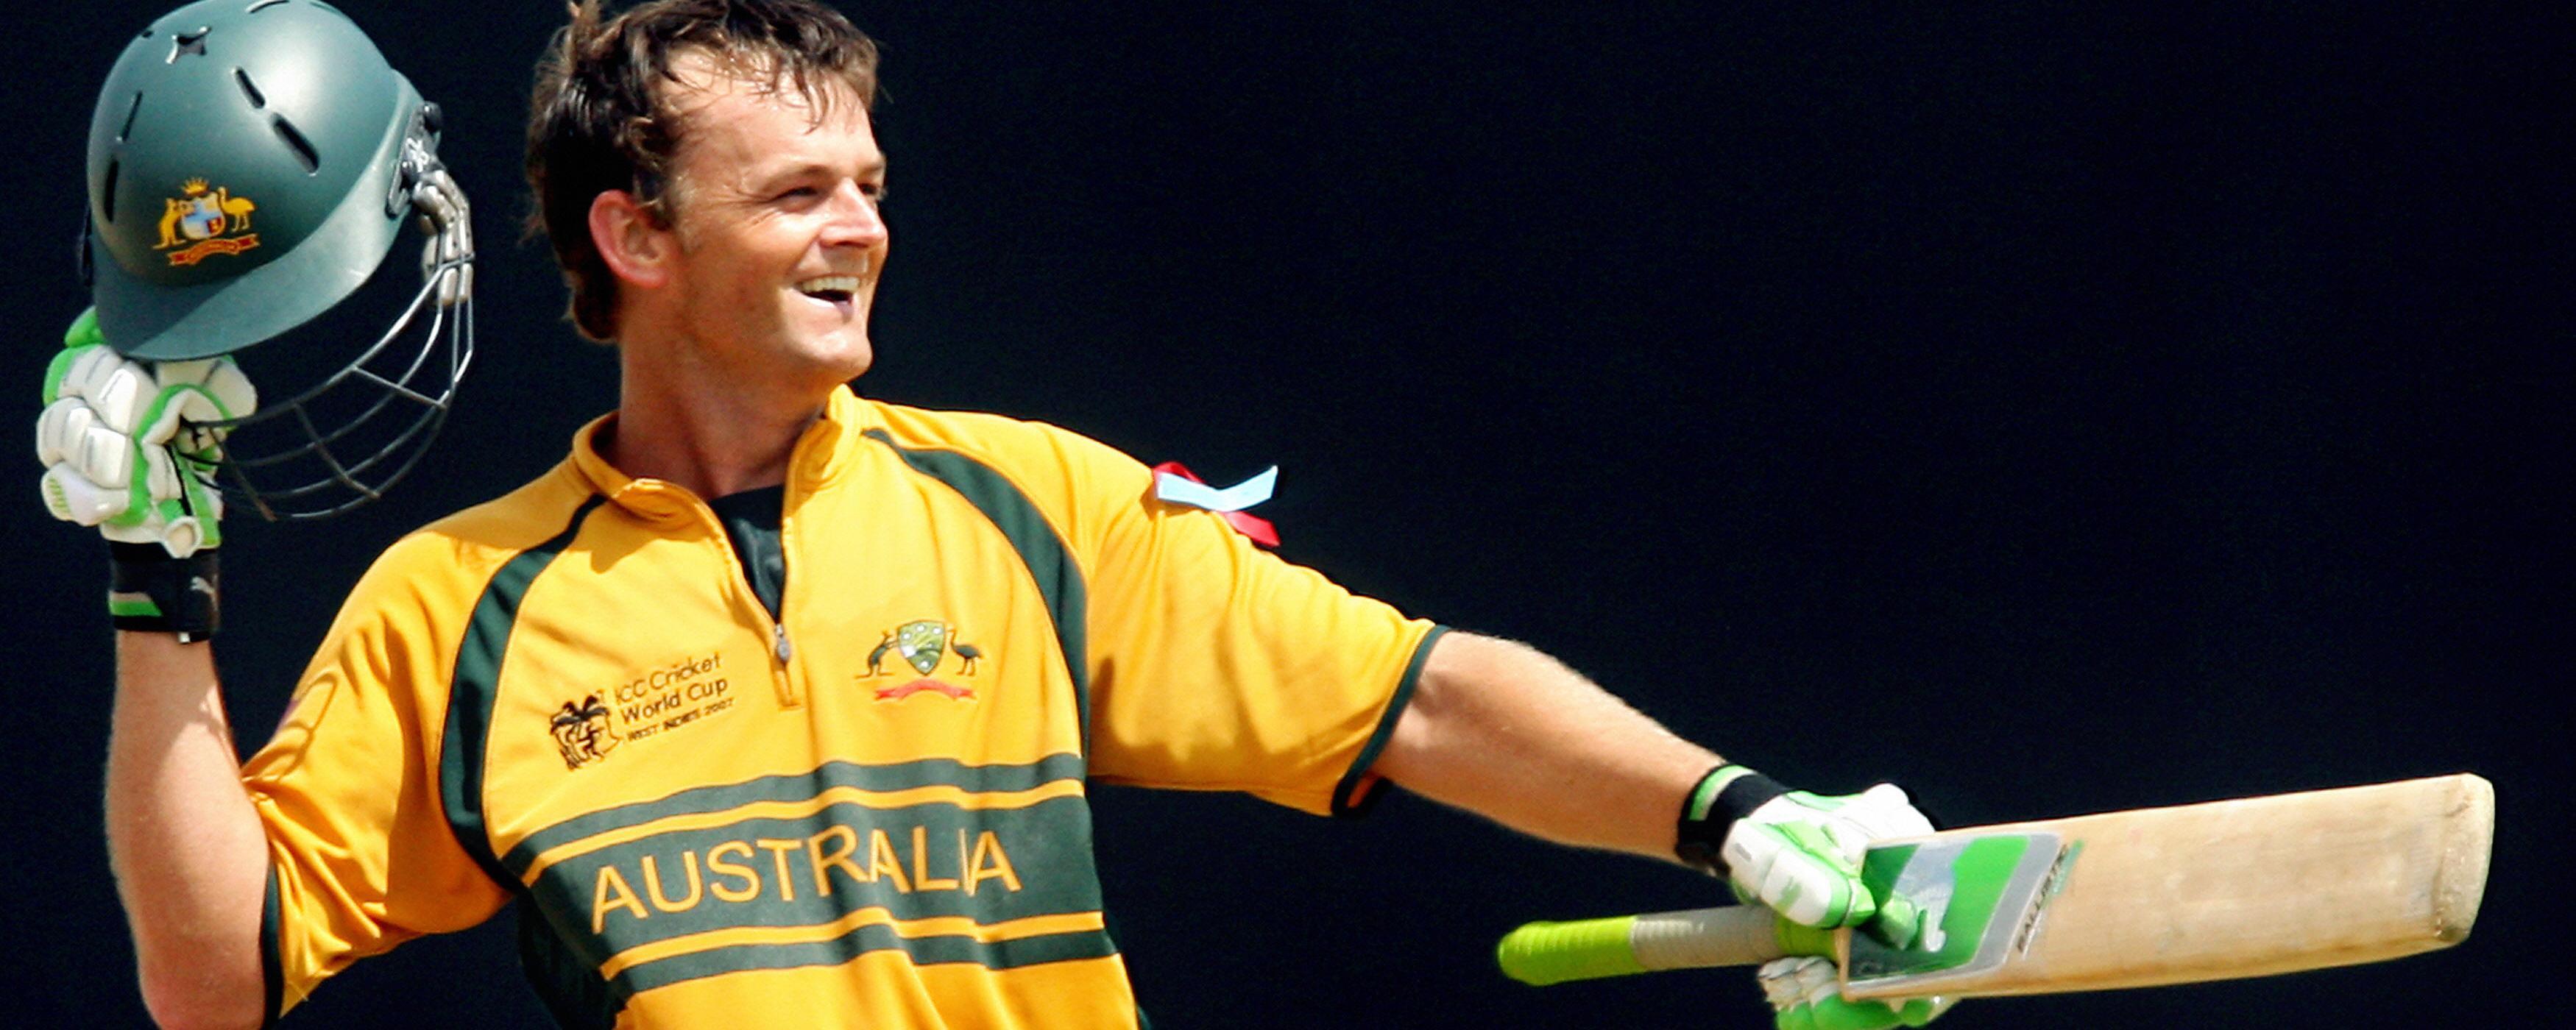 Full Scorecard Of Australia Vs Sri Lanka World Cup Final